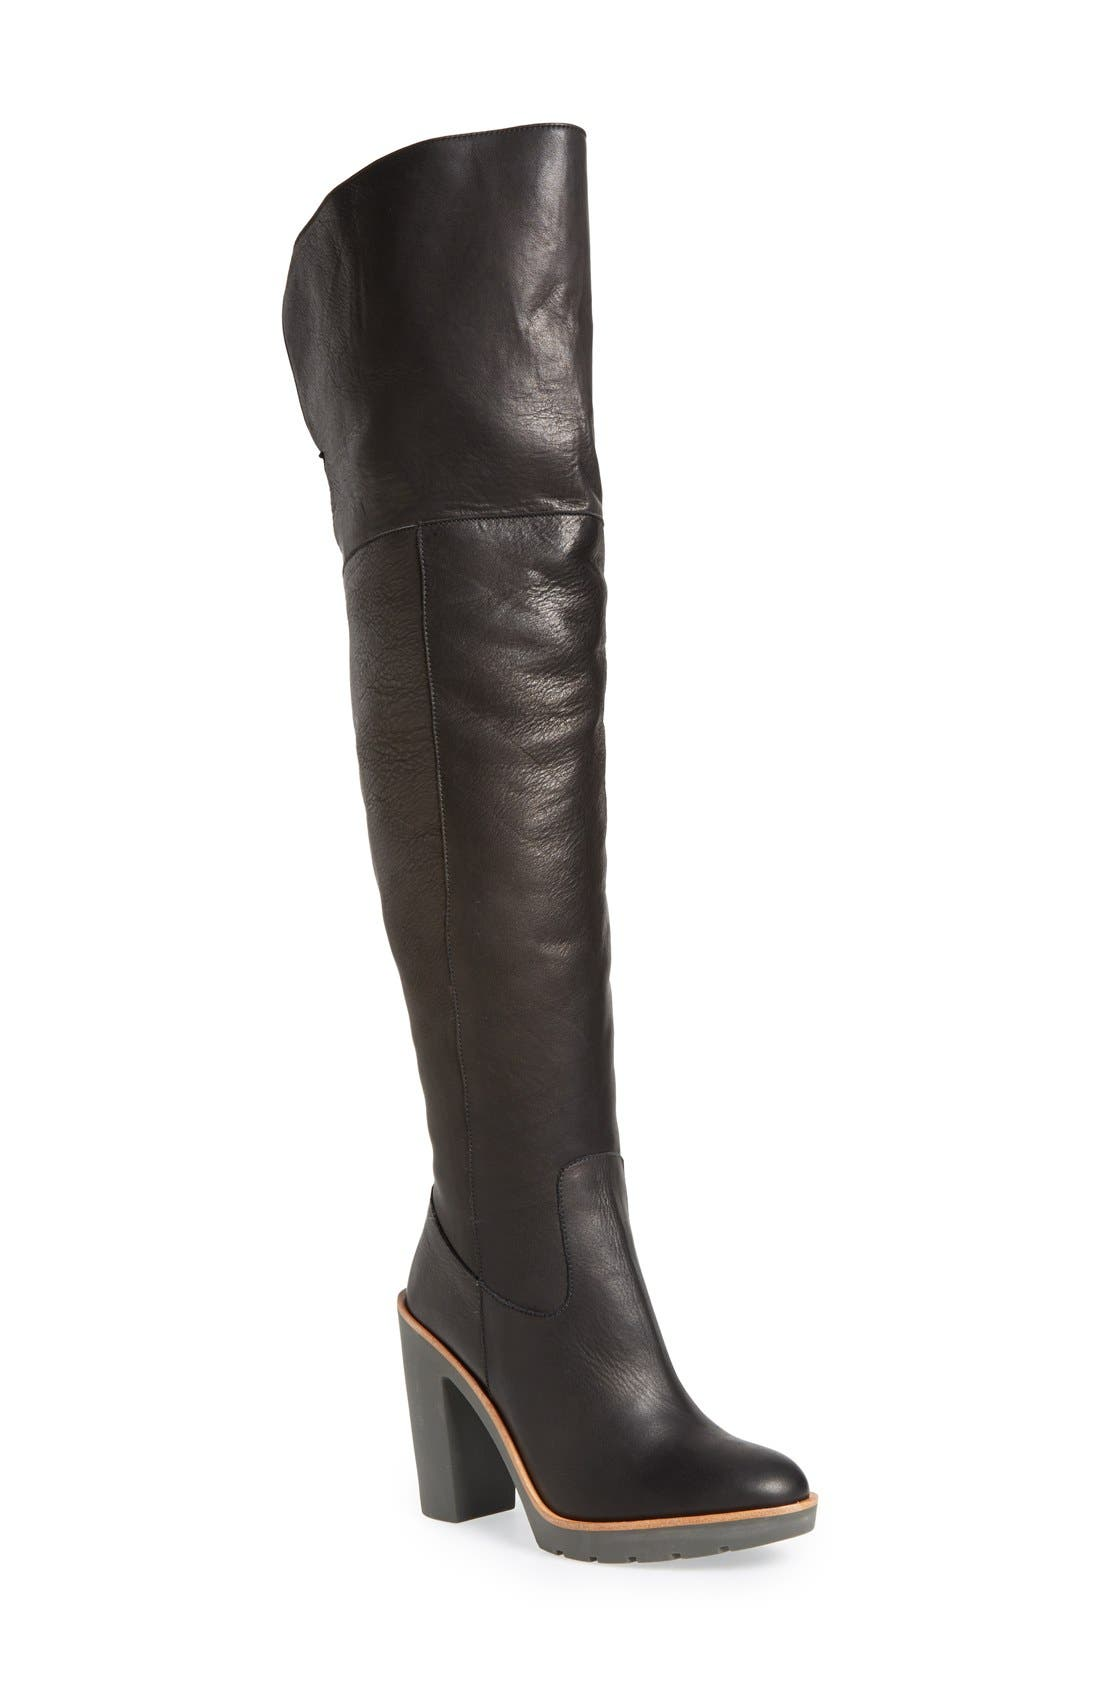 Main Image - kate spade new york 'gabby' genuine shearling linedover the knee boot (Women)